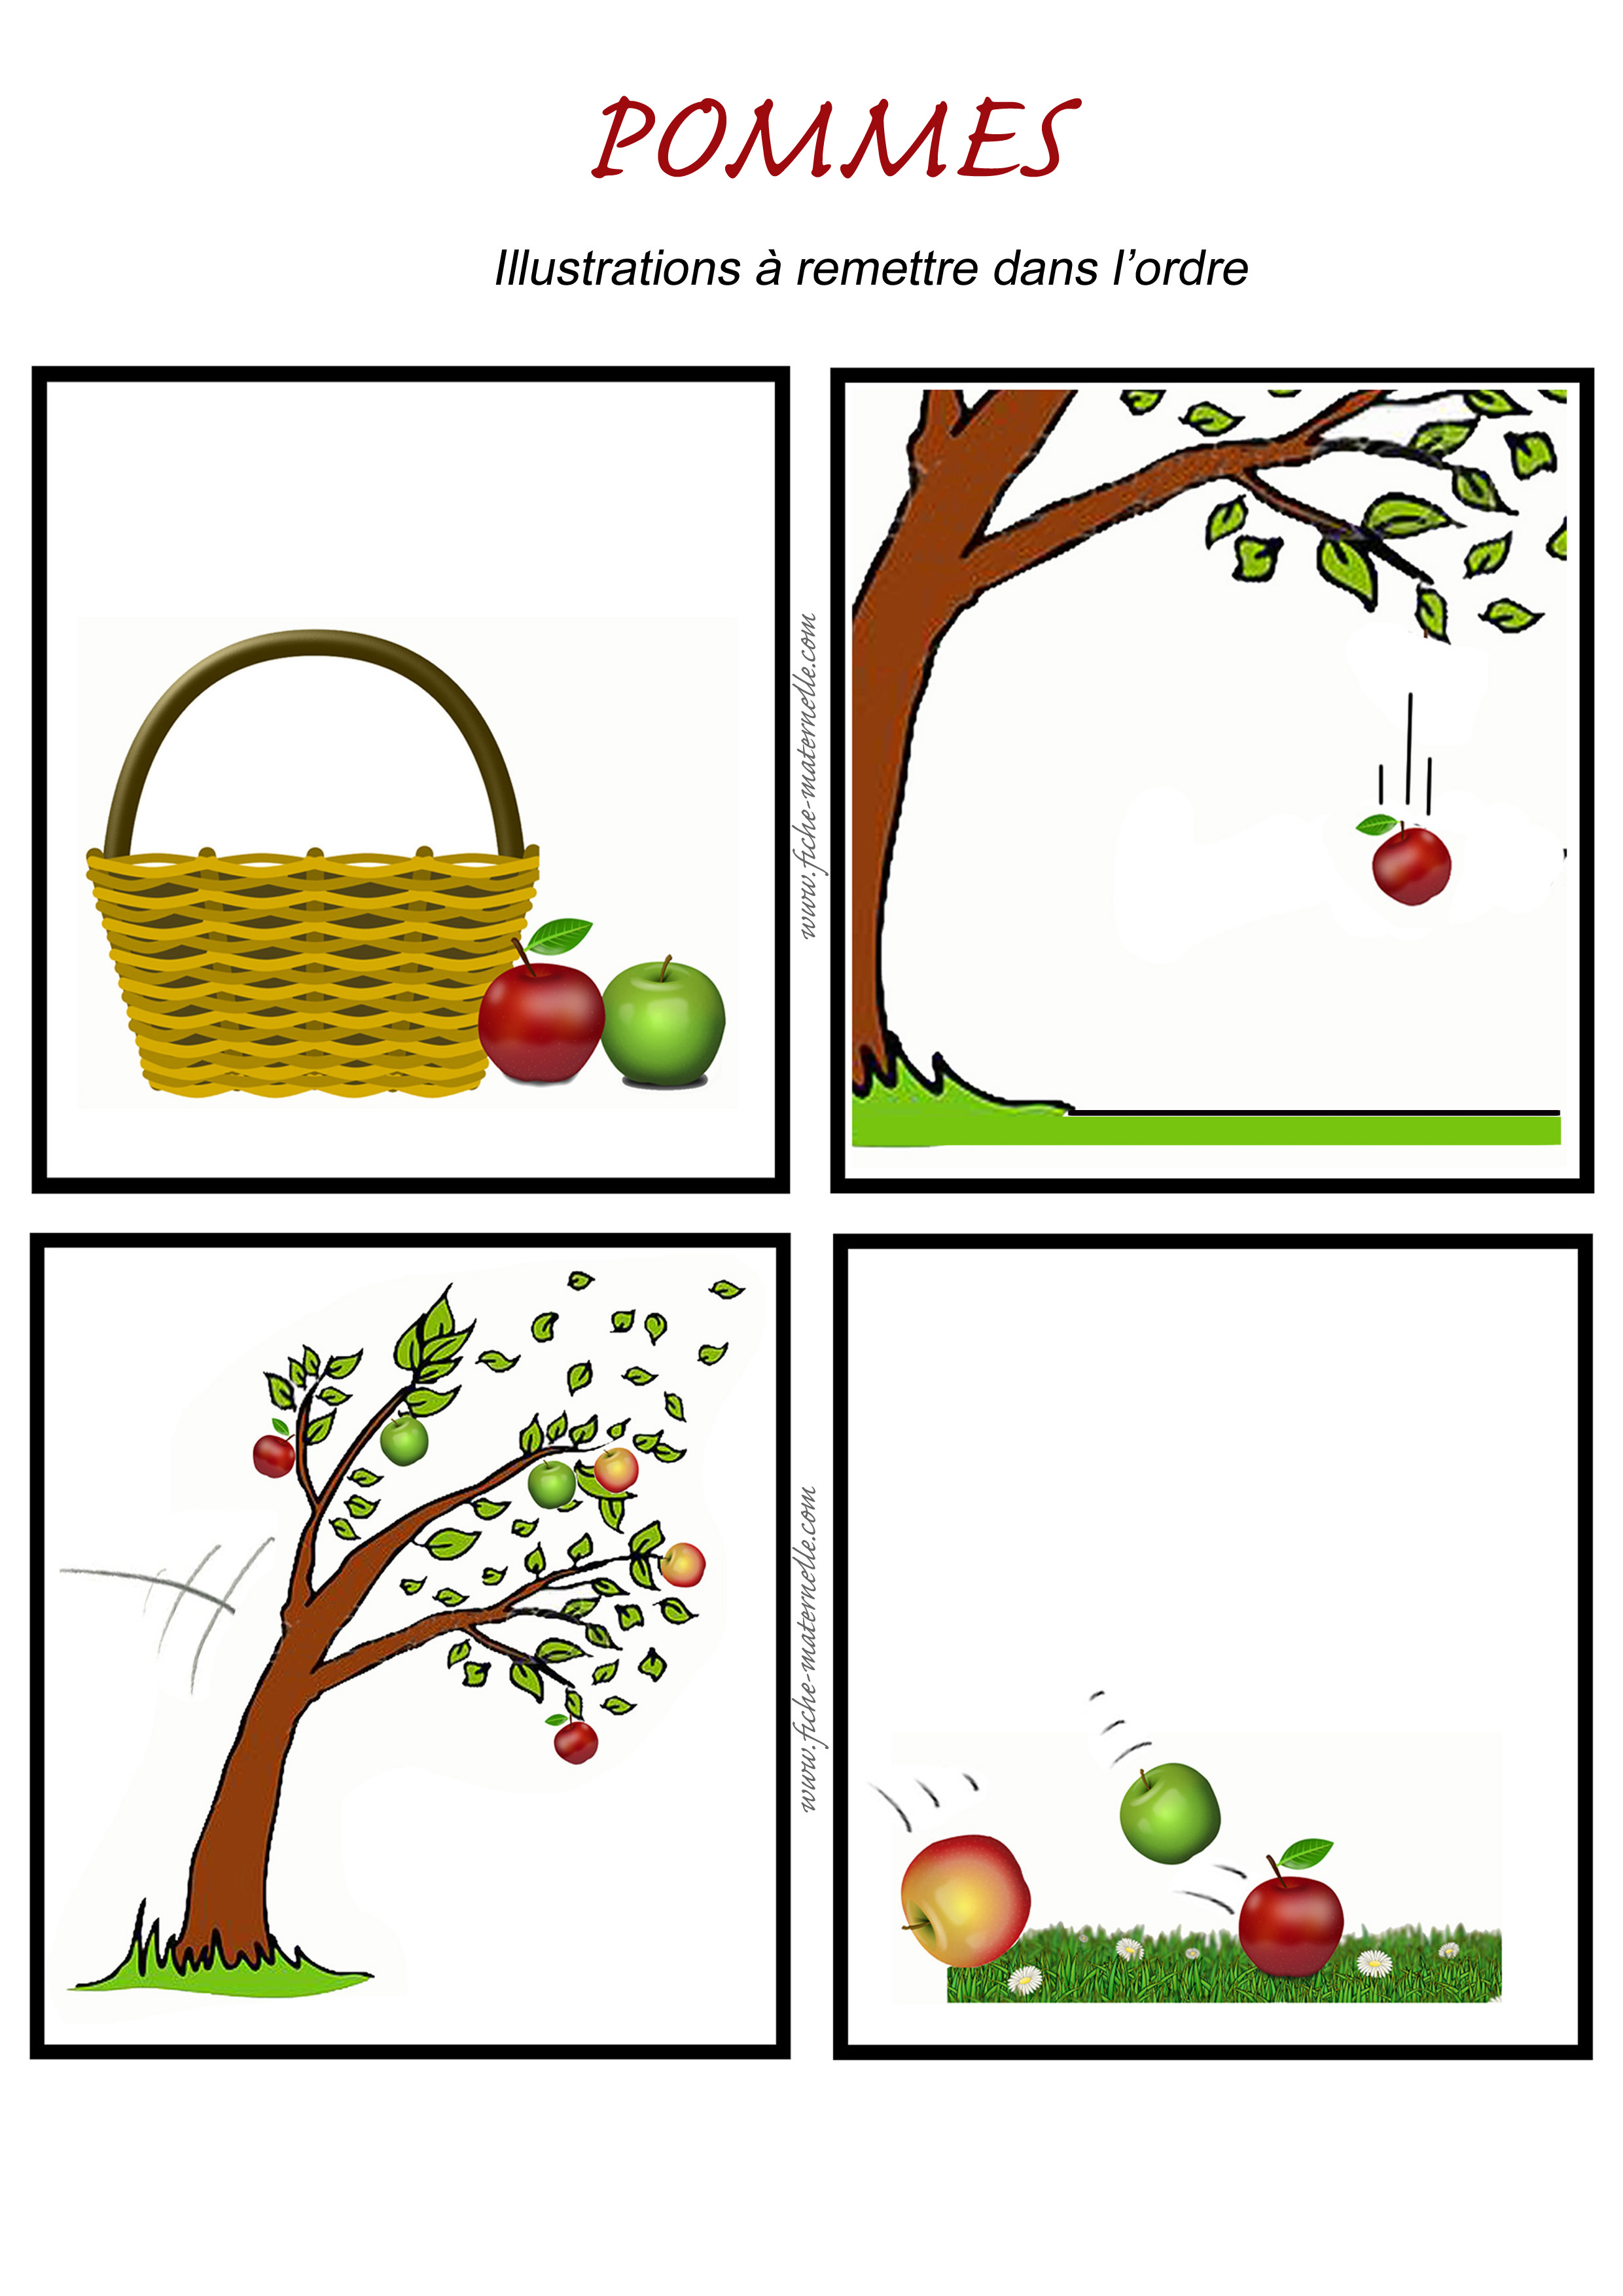 Poésie Dautomne Pommes